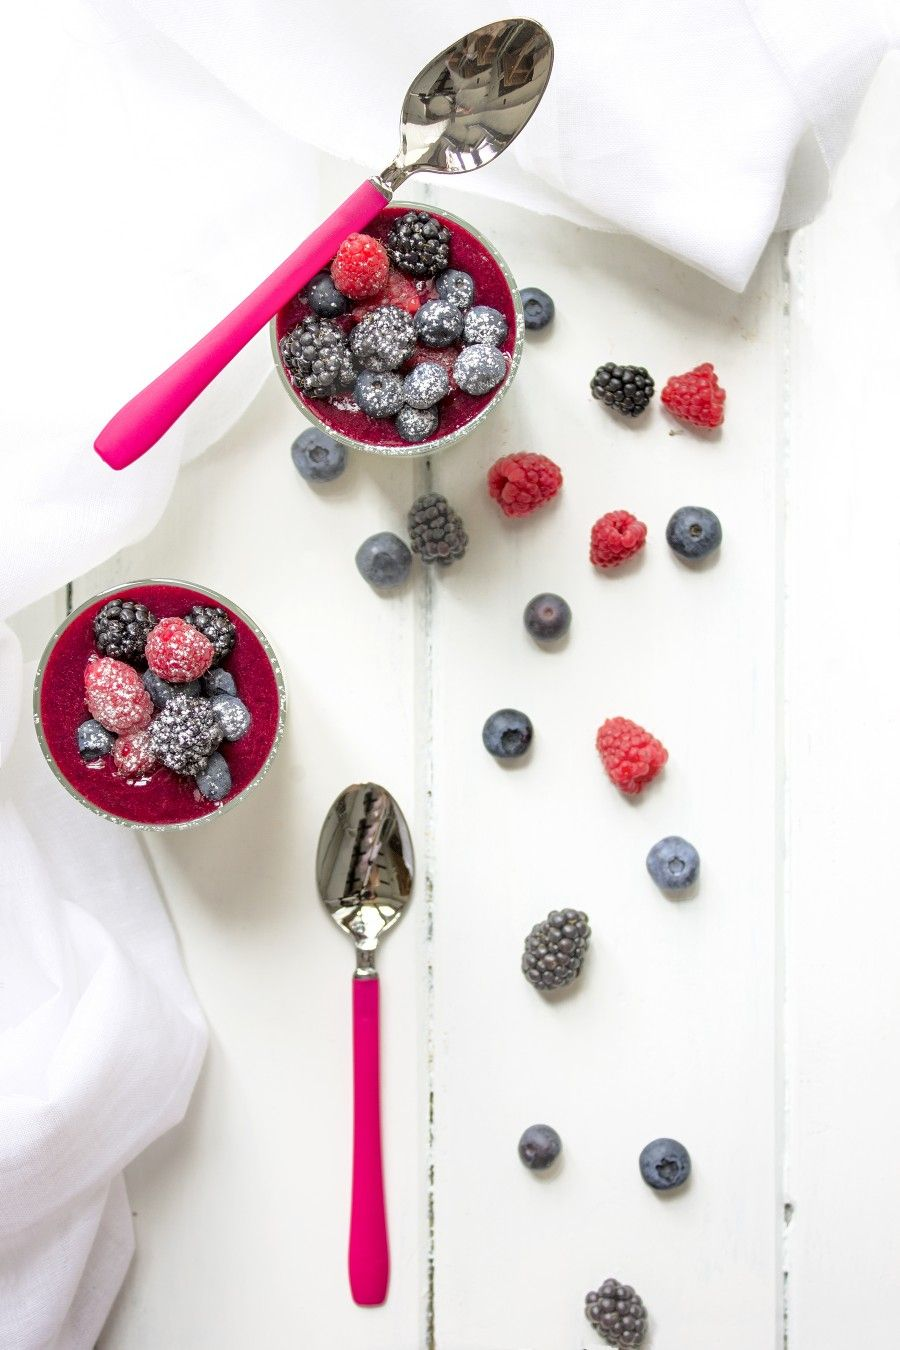 finta-panna-cotta-allo-yogurt-contemporaneo-food